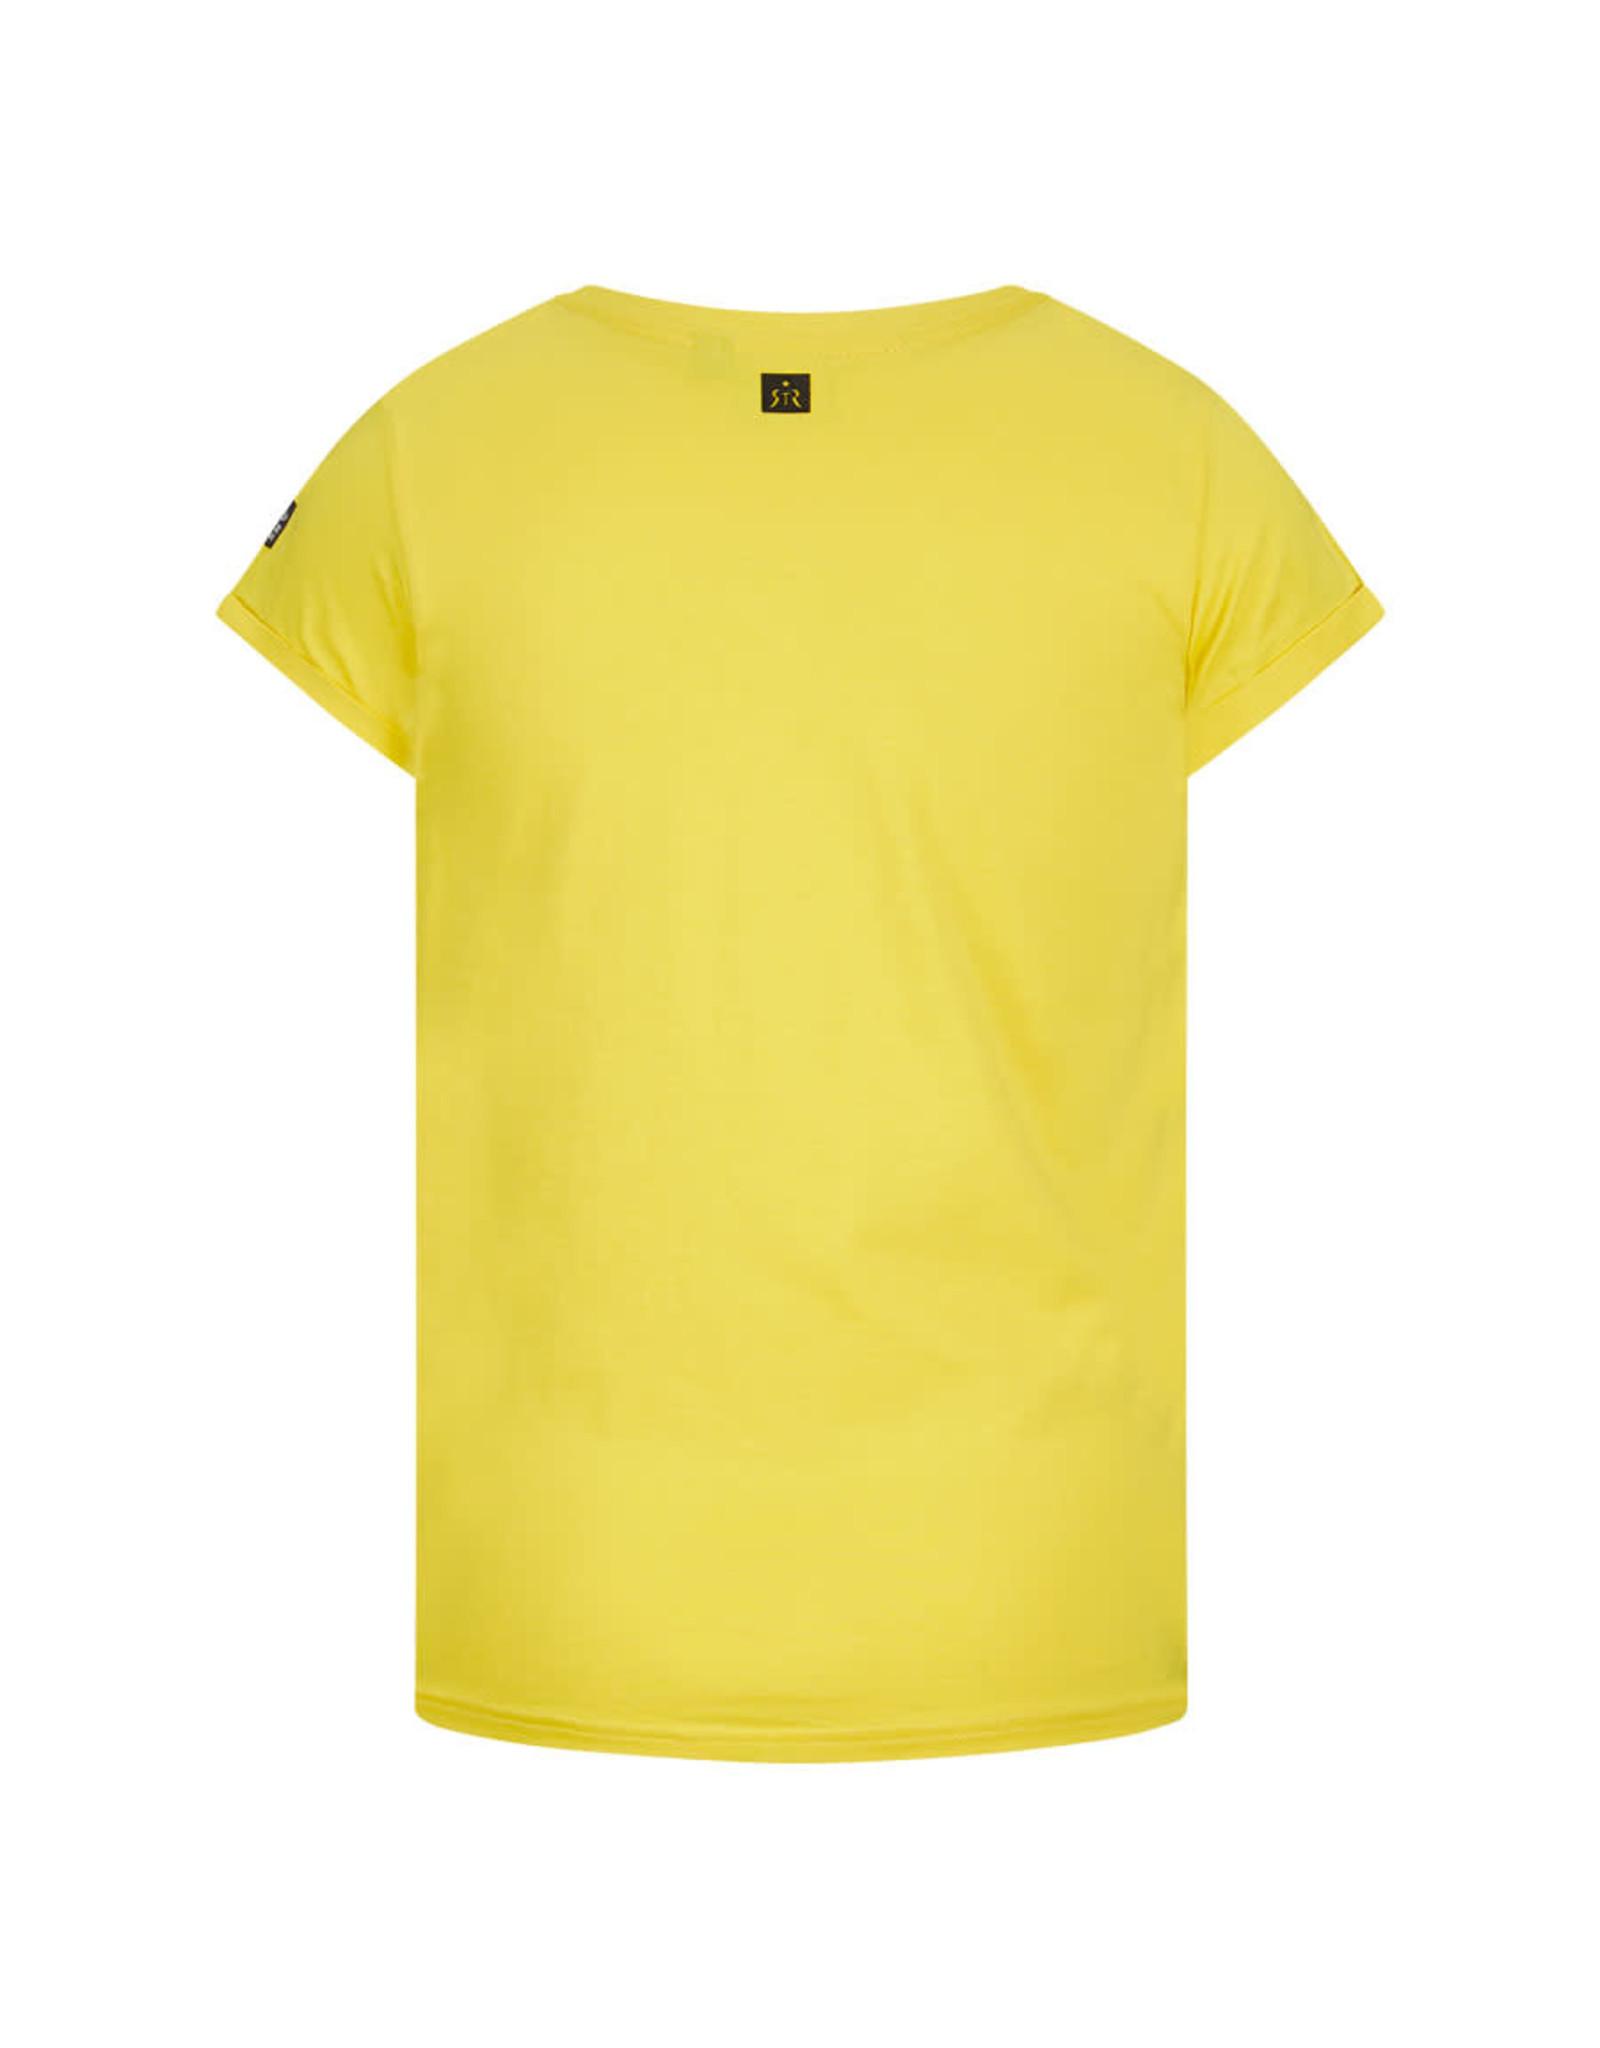 Retour Bibi 3026 yellow